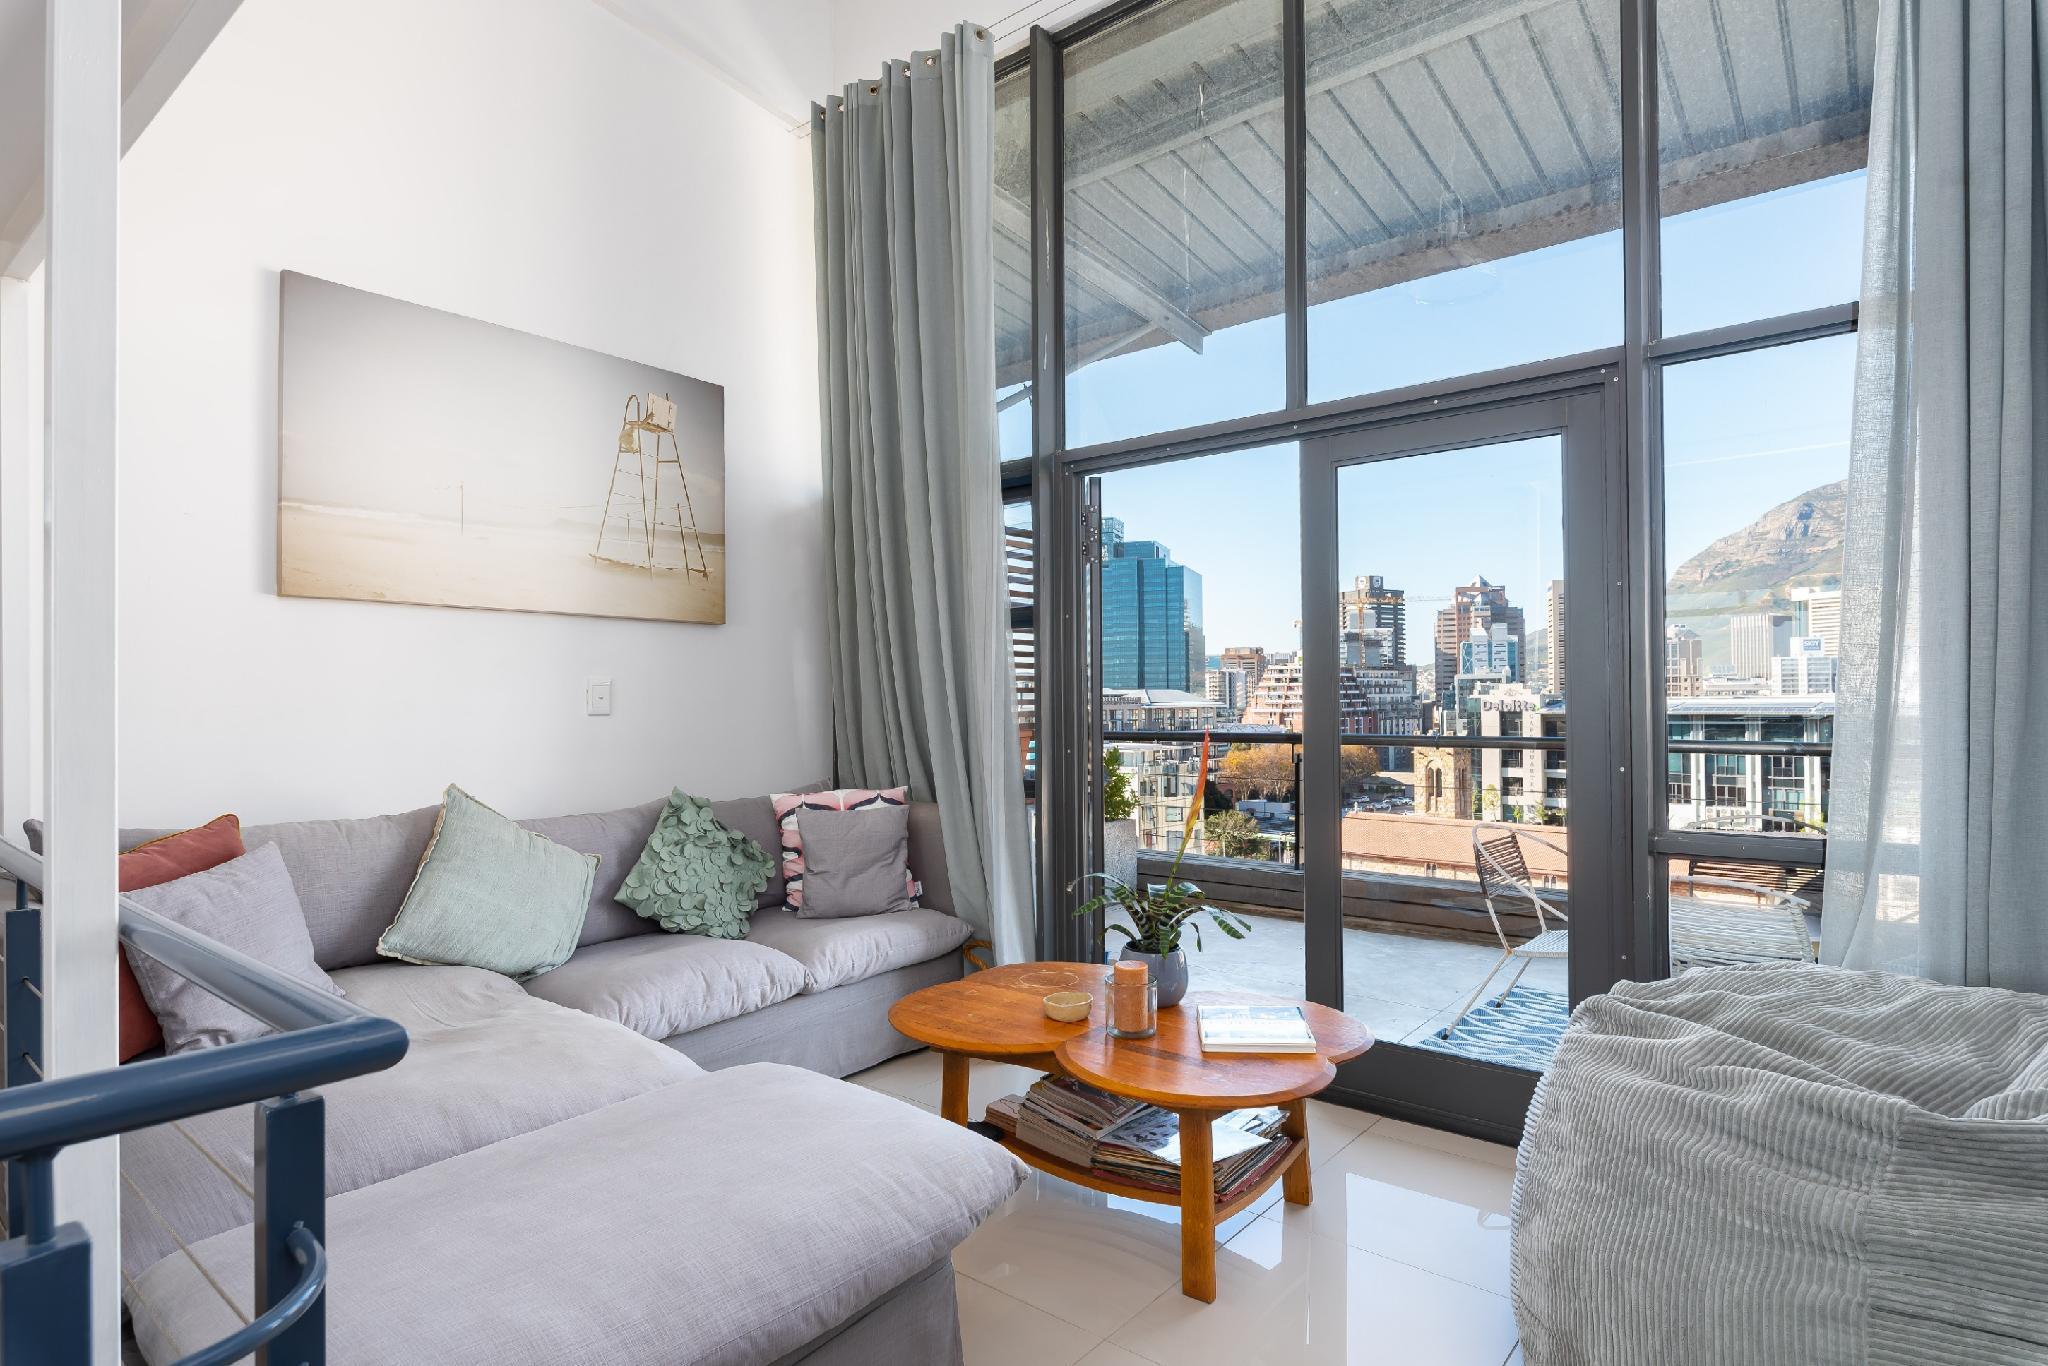 Stylish 2 Bedroom Mountain View Loft Apartment